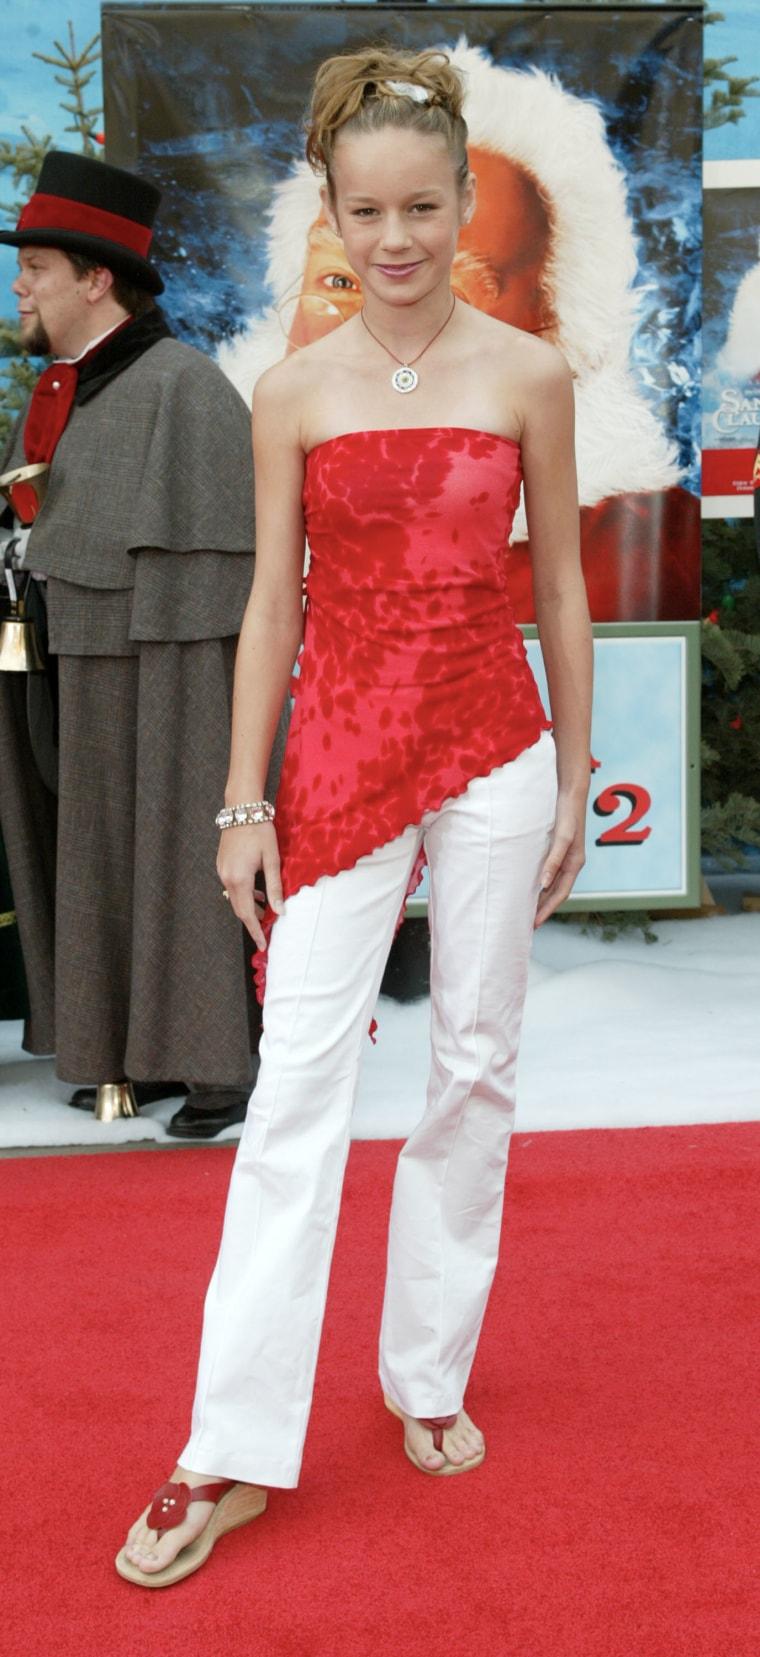 Brie Larson At The Film Premiere of Santa Claus 2